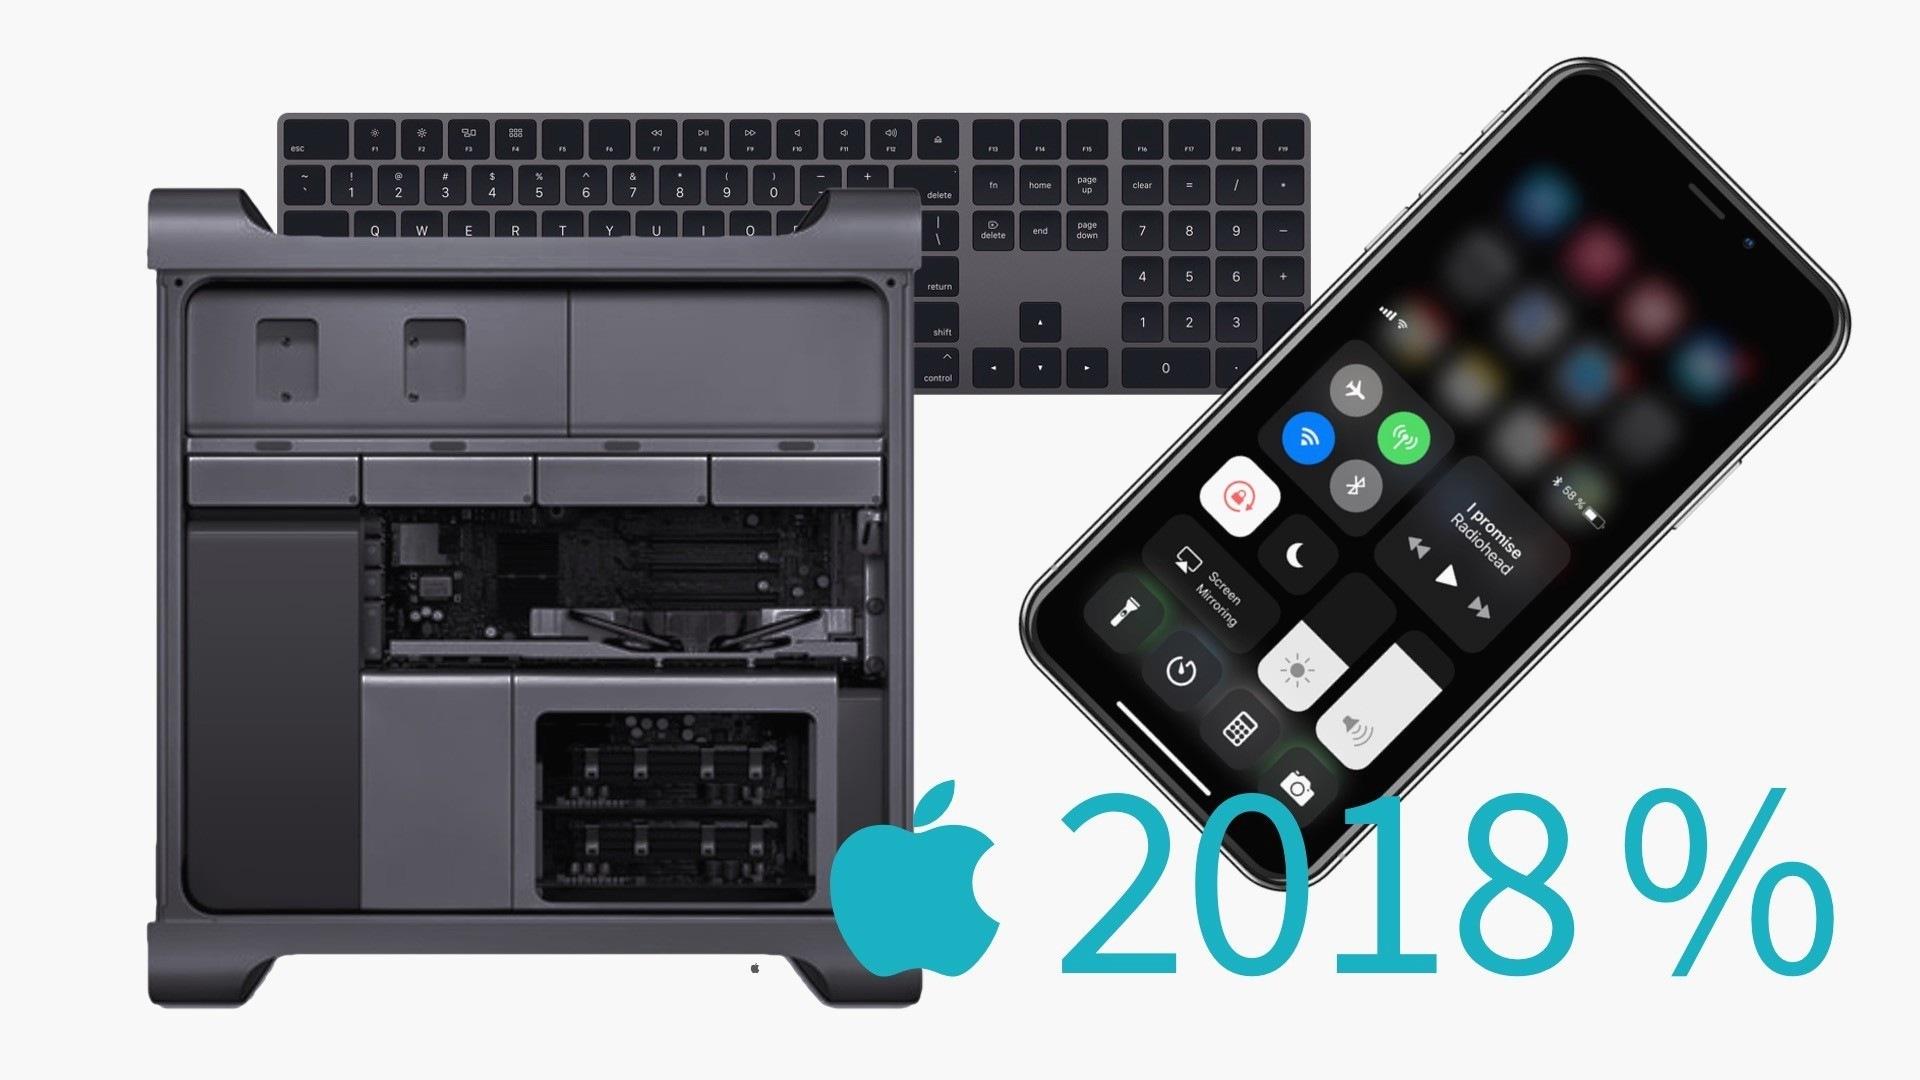 Iphone 6 Plus Camera Nieuw Luxury Cool Geometric Backgrounds - Apple Mac Pro , HD Wallpaper & Backgrounds